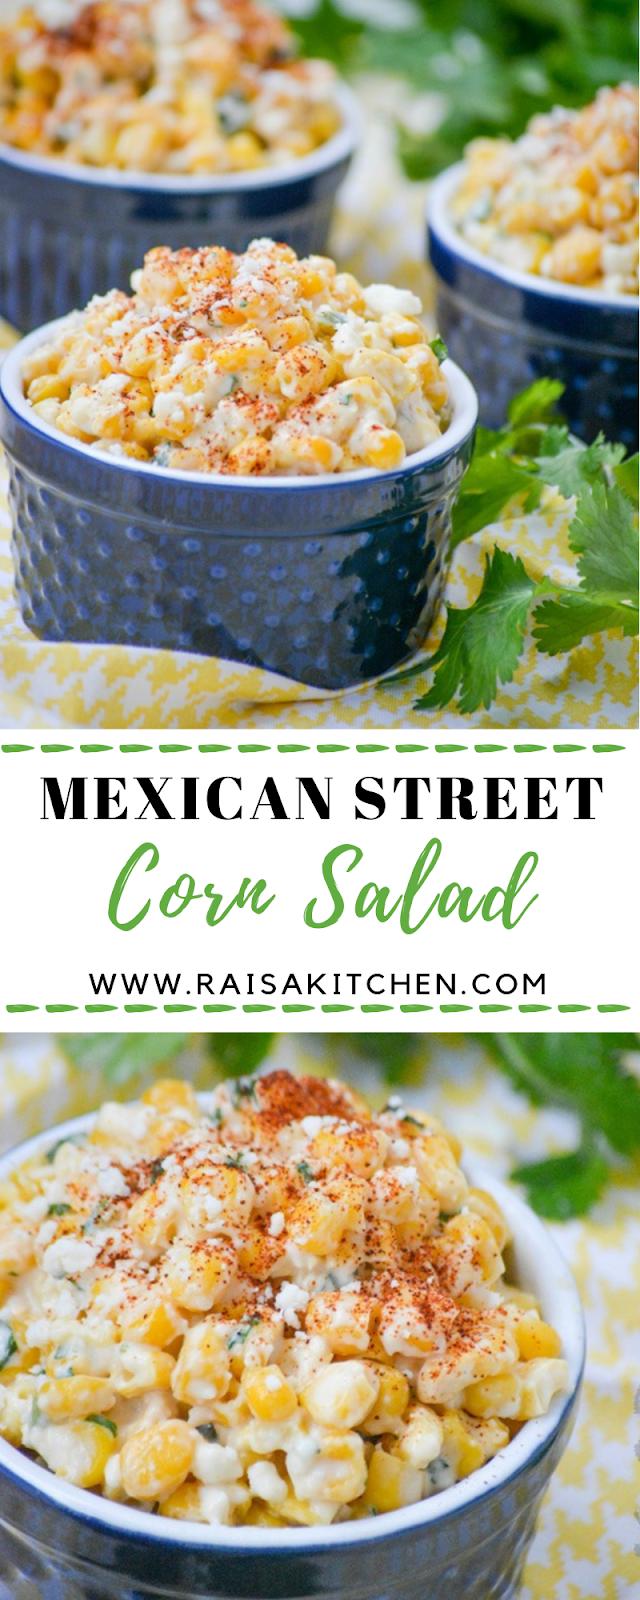 Mexican Strееt Cоrn Salad